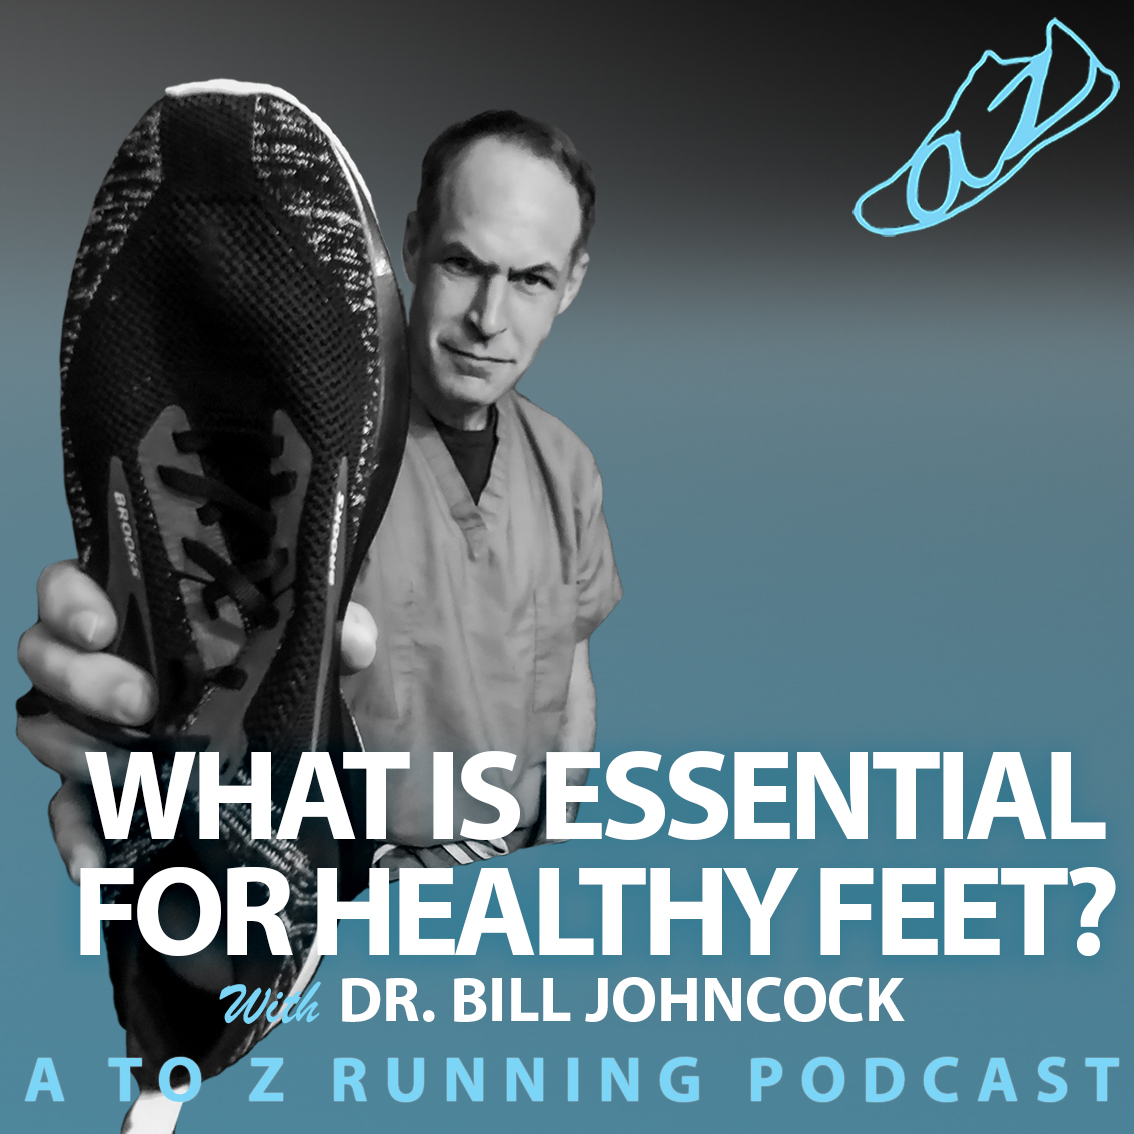 Dr Johncock Foot Health